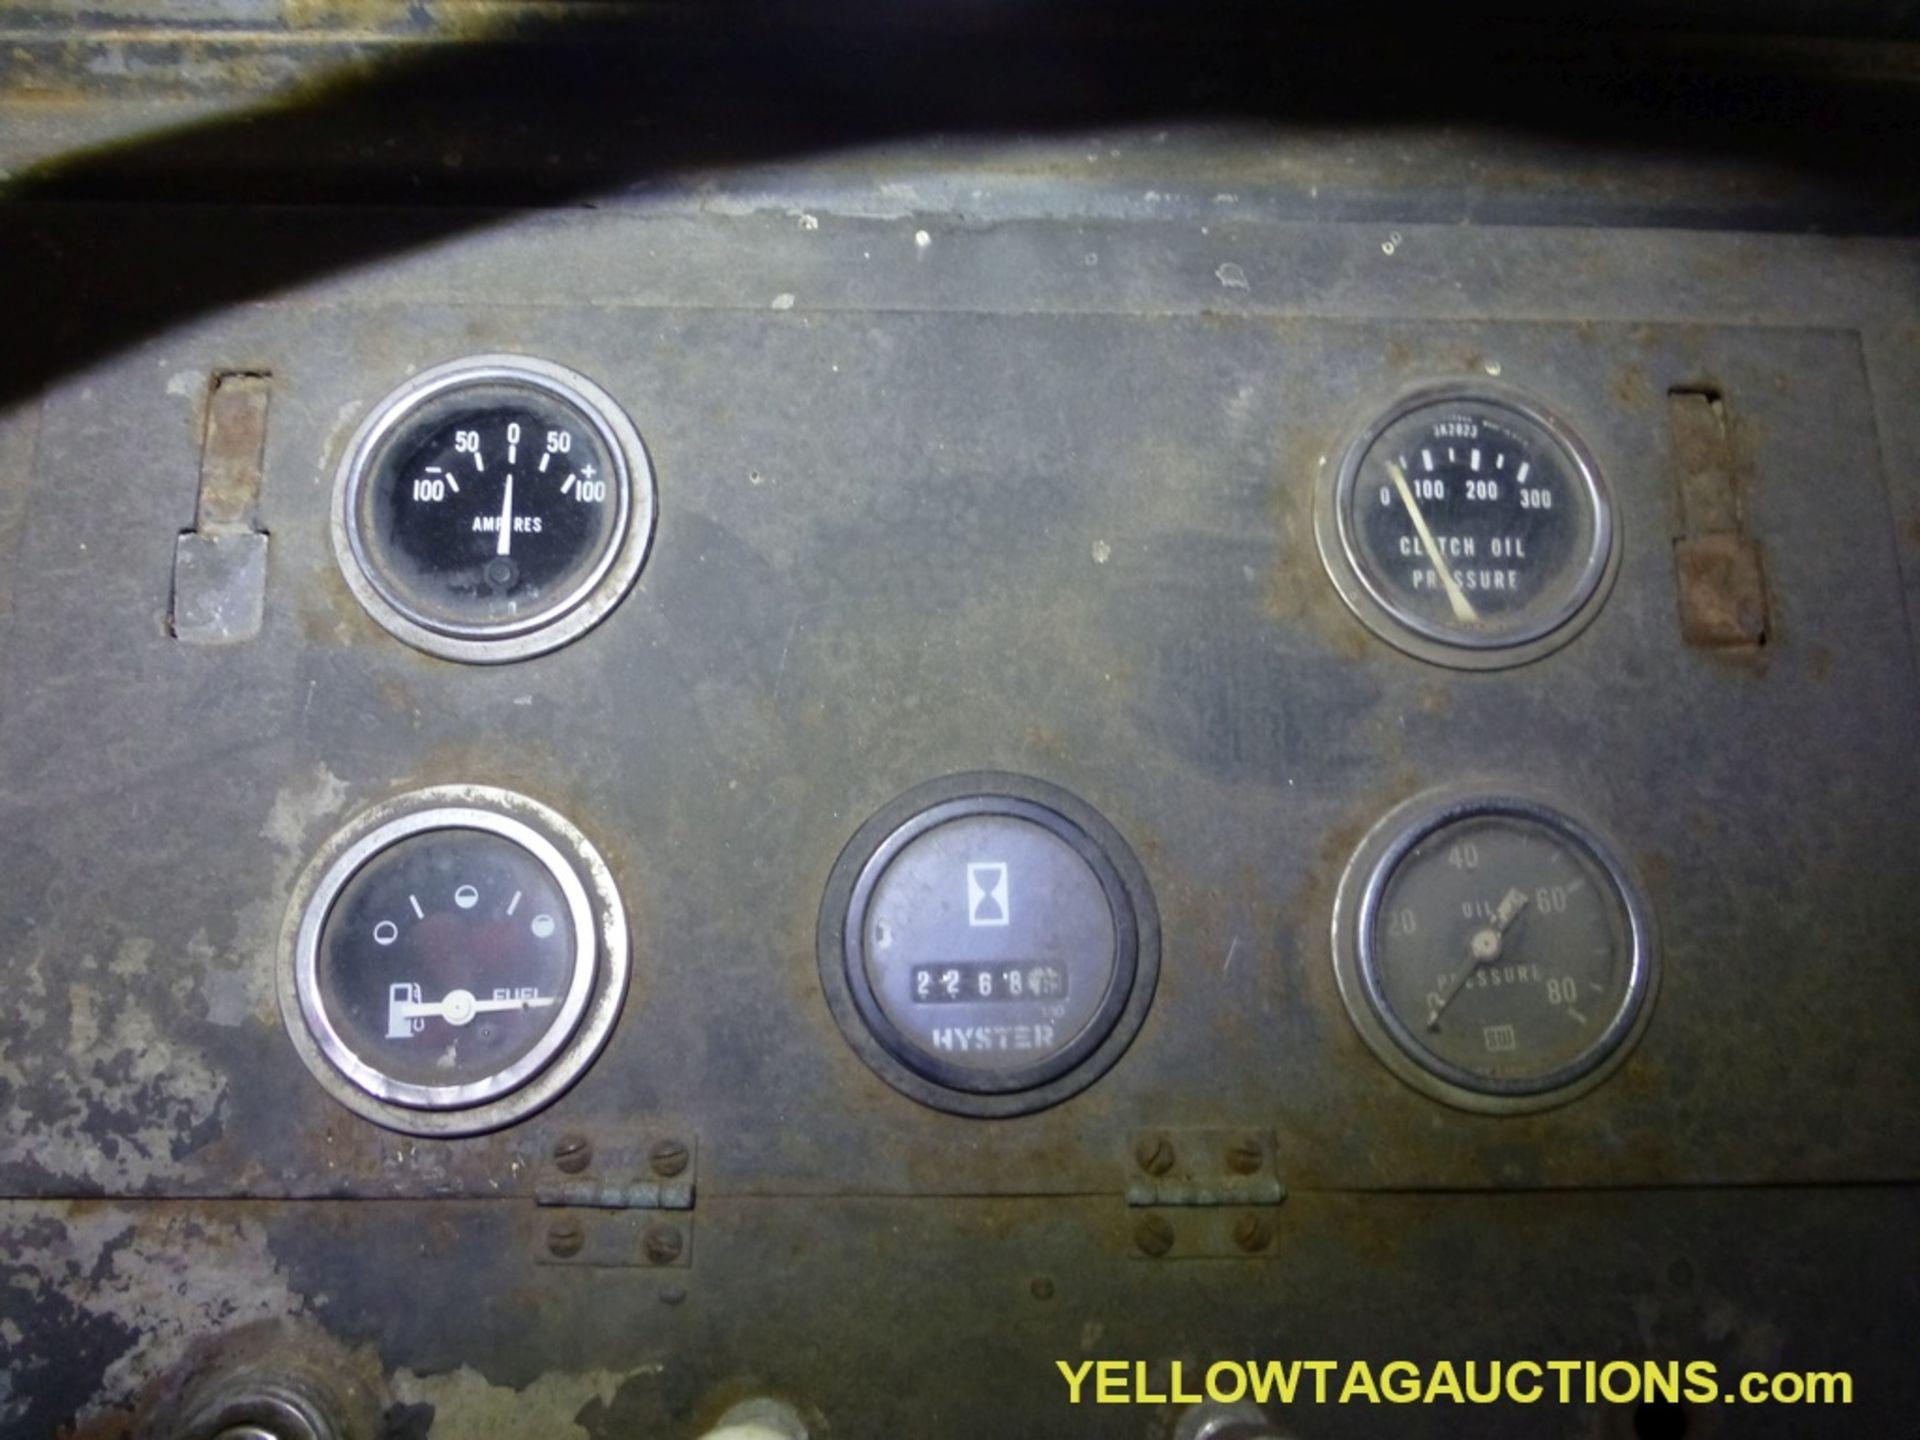 Track Mobile Rail Car Mover | Model No. 7TM; Bad Tie Rod - Image 11 of 42